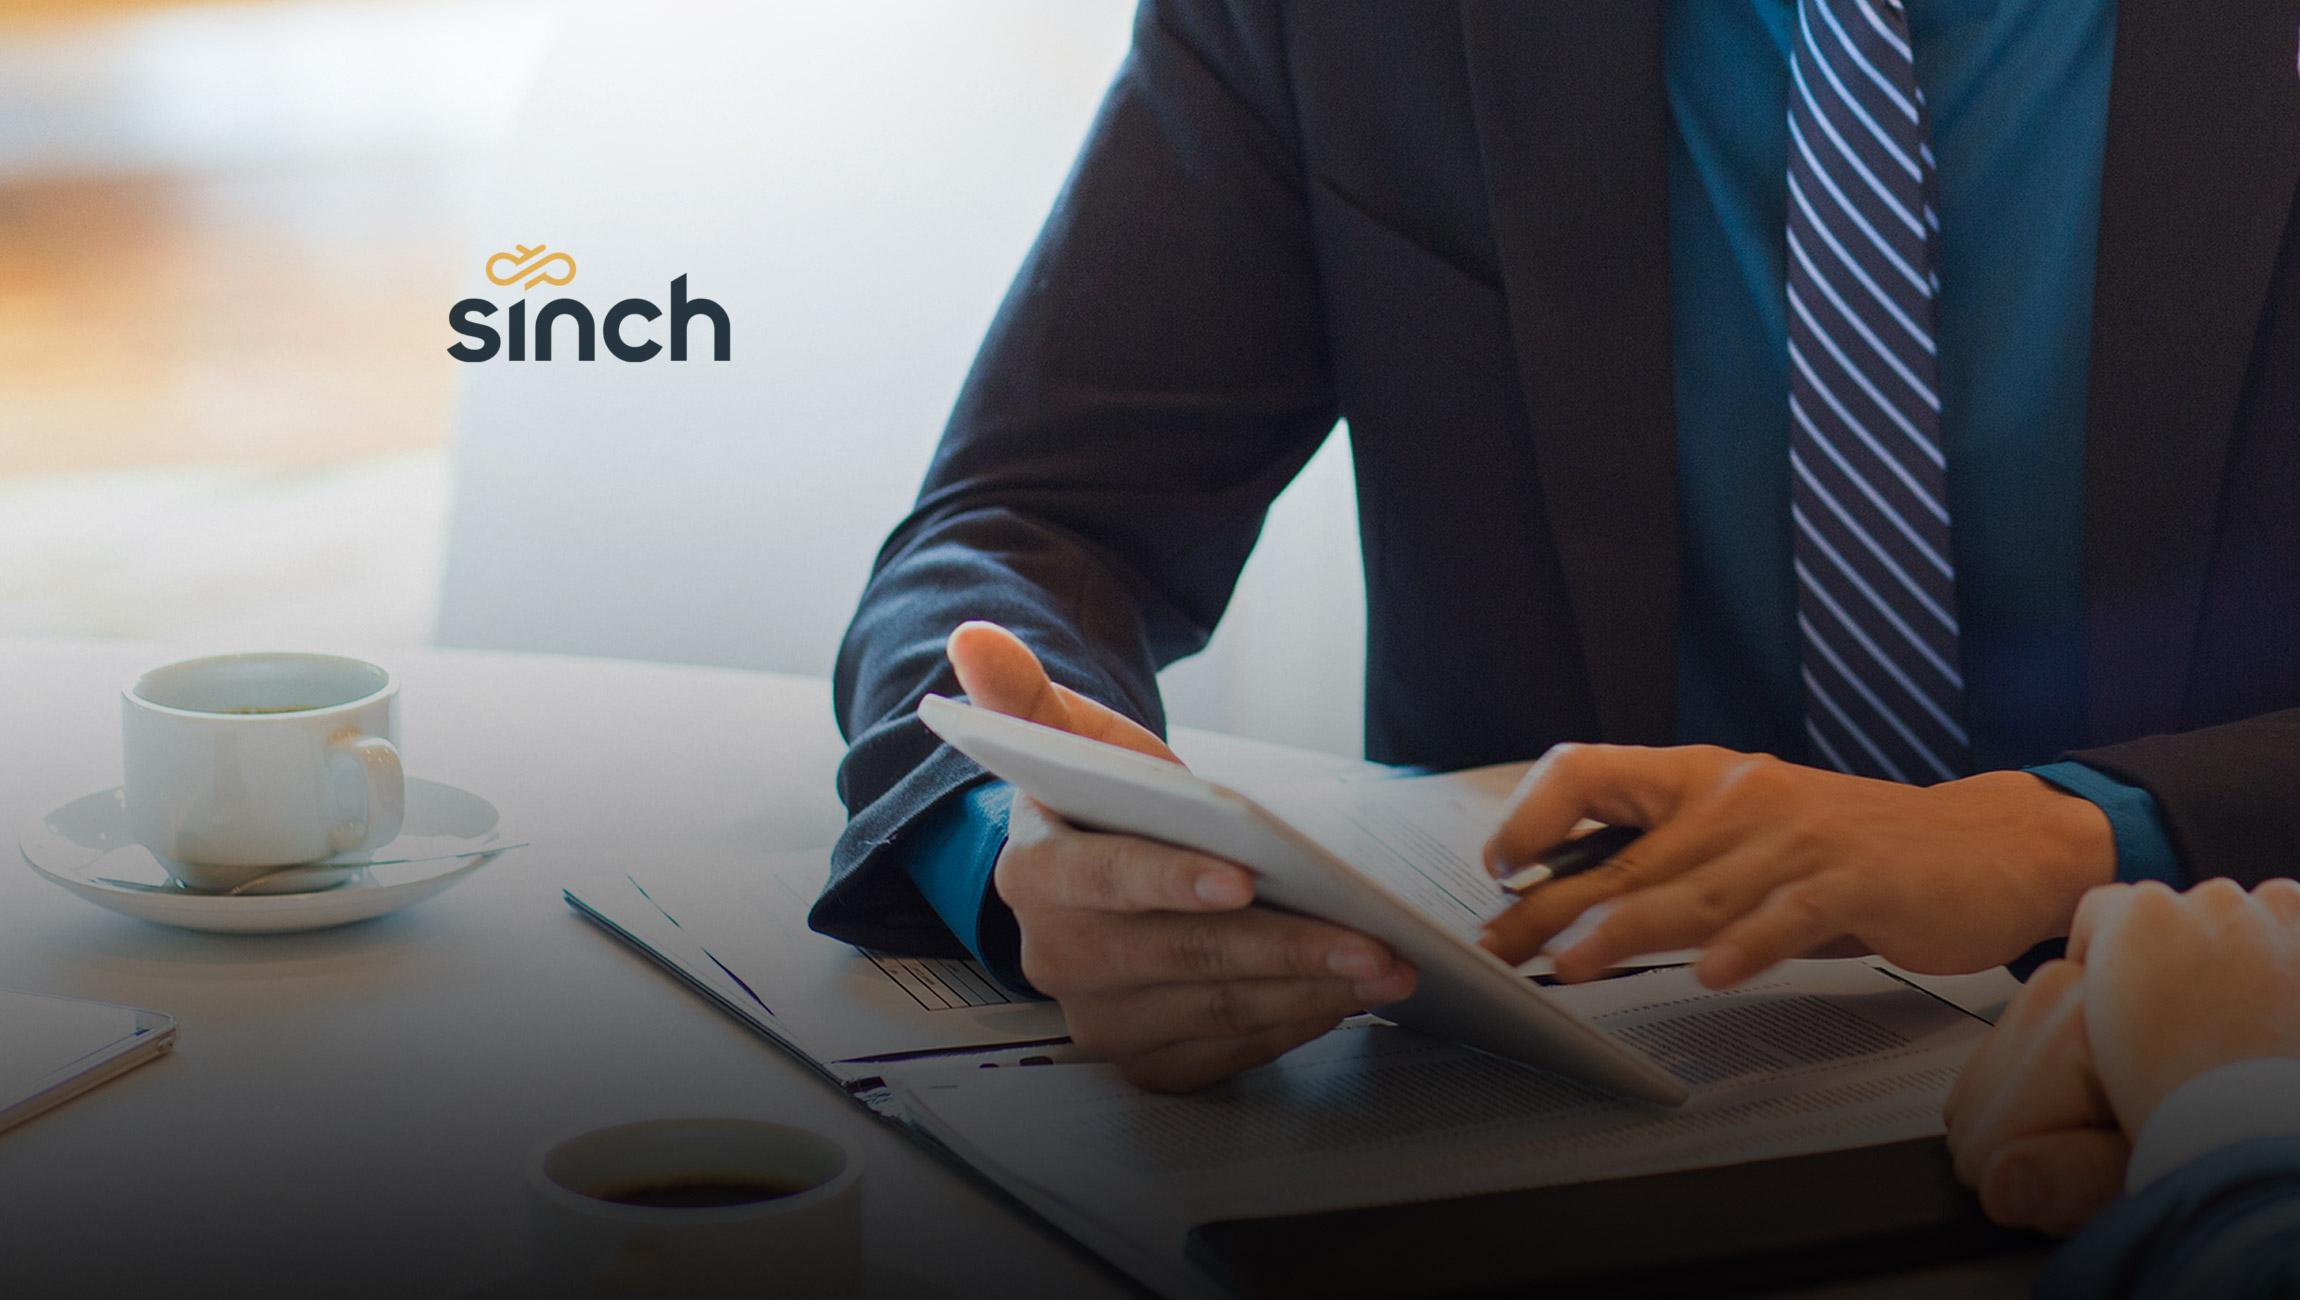 Sinch AB (publ): Sinch completes acquisition of SAP Digital Interconnect